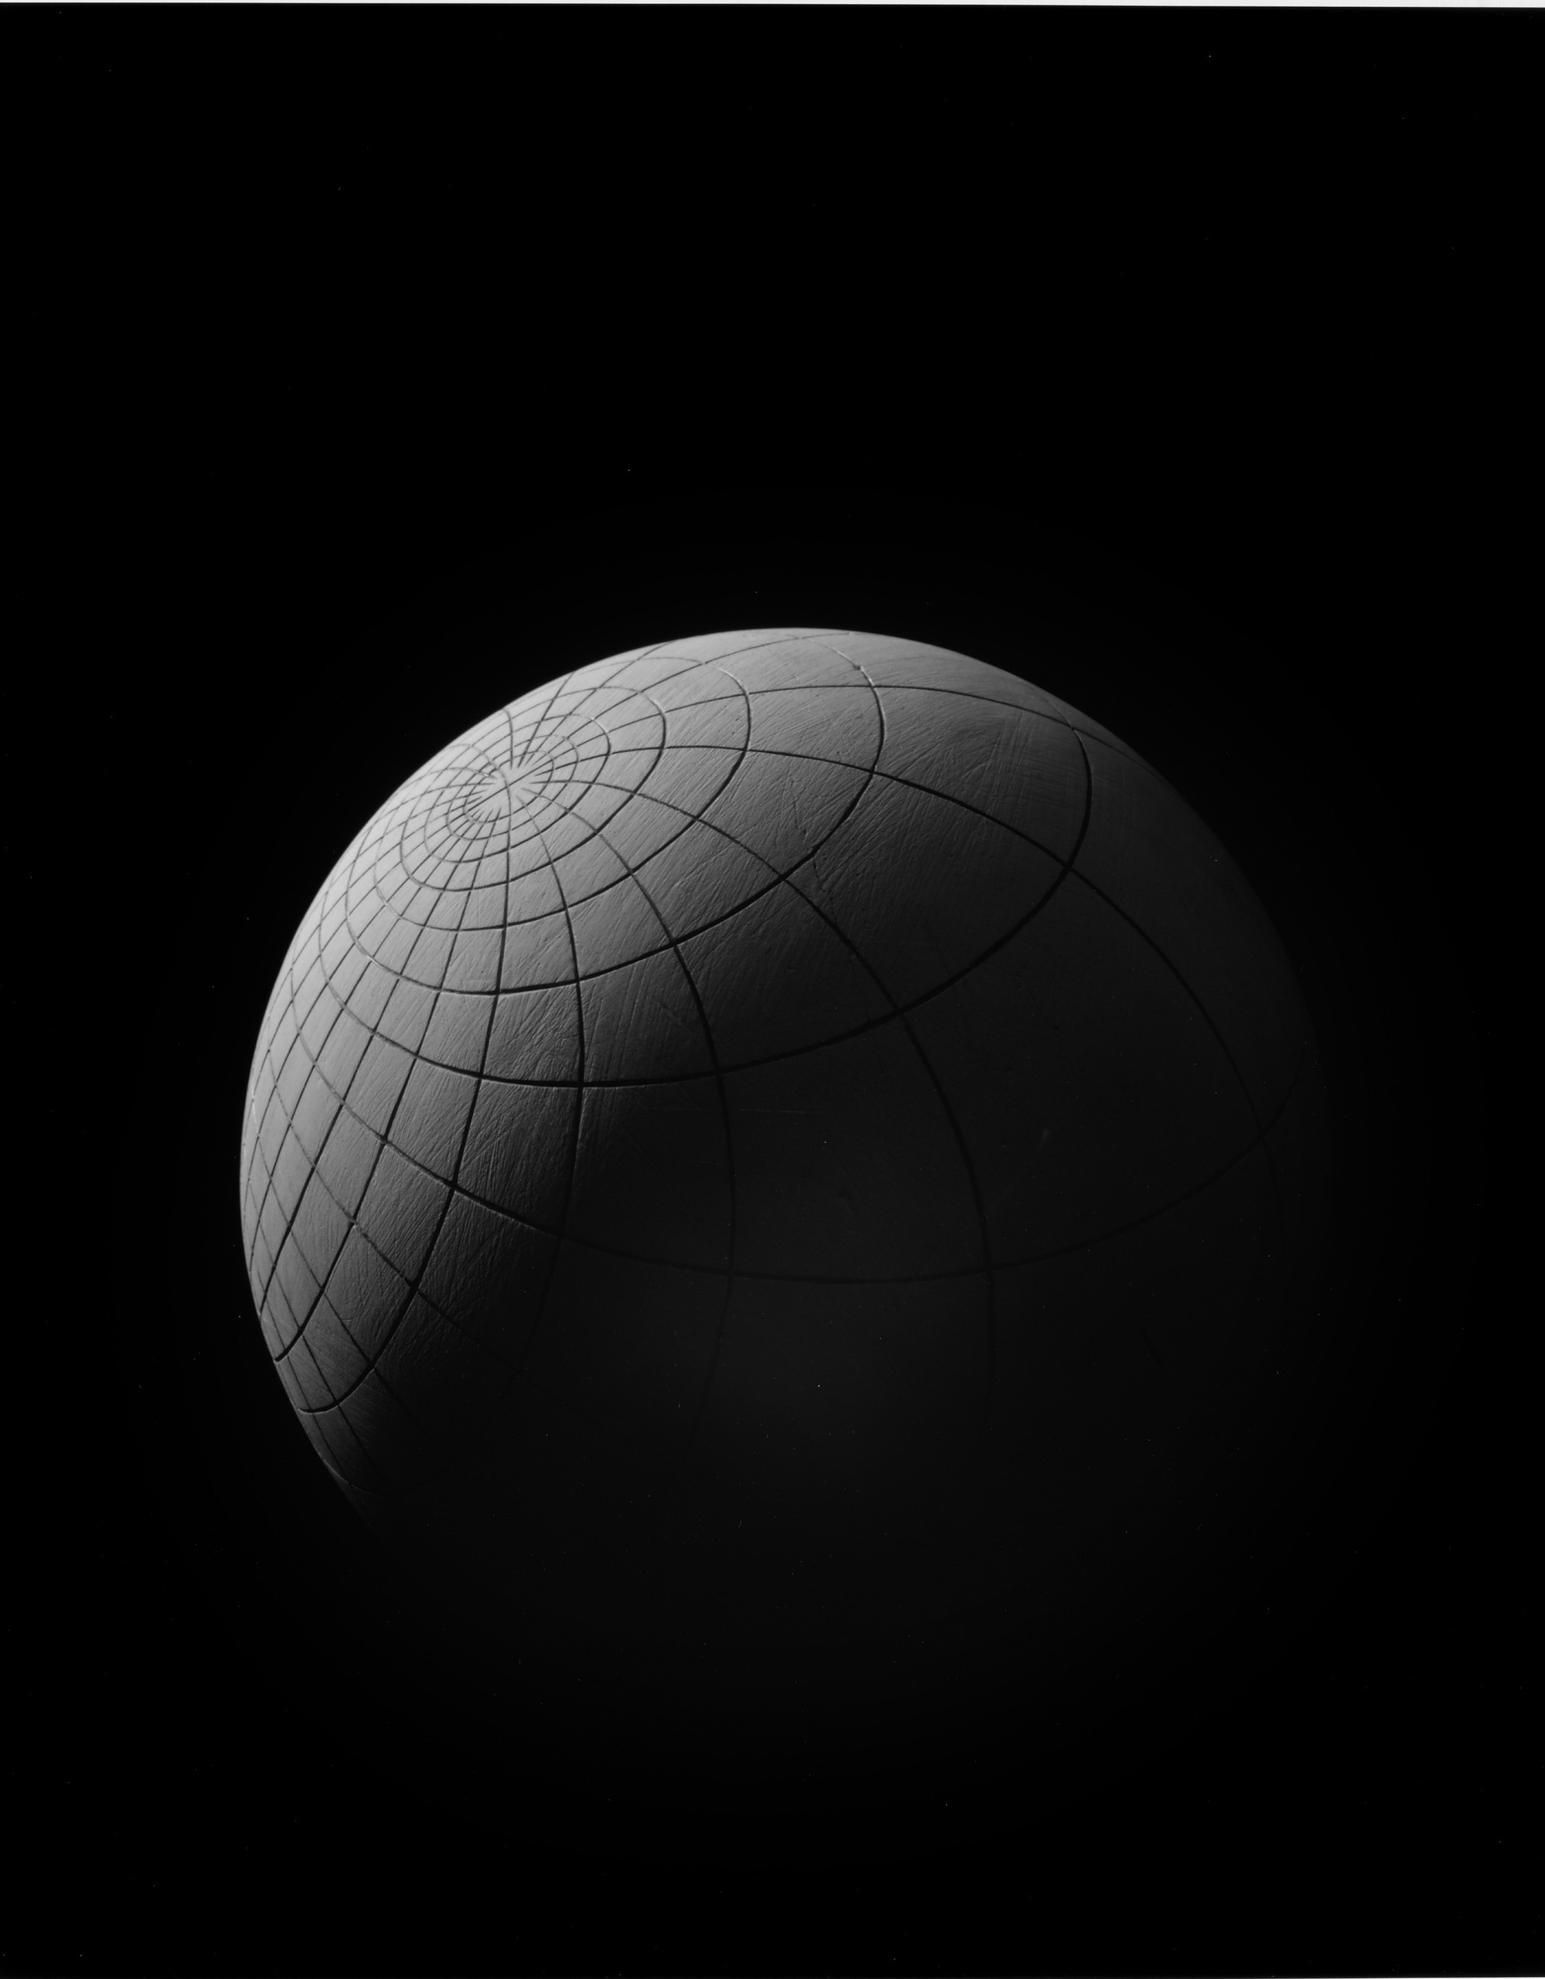 Hiroshi Sugimoto-Mathematical Form: Surface 0011-2004